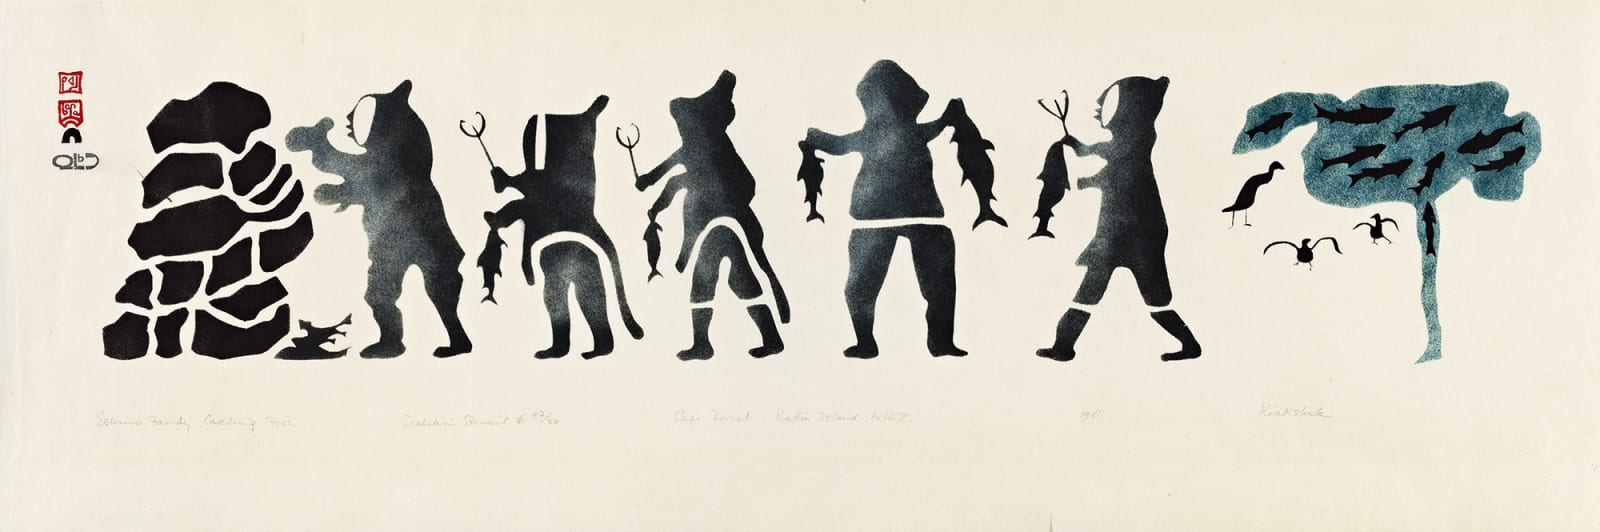 Lot 27 KIAKSHUK (1886-1966) m., KINNGAIT (CAPE DORSET) Eskimo Family Caching Fish, 1960 (1961 #4) stencil, 10.75 x 35 in (27.3 x 88.9 cm). Estimate: $3,000 — $5,000 Price realized: $2,880